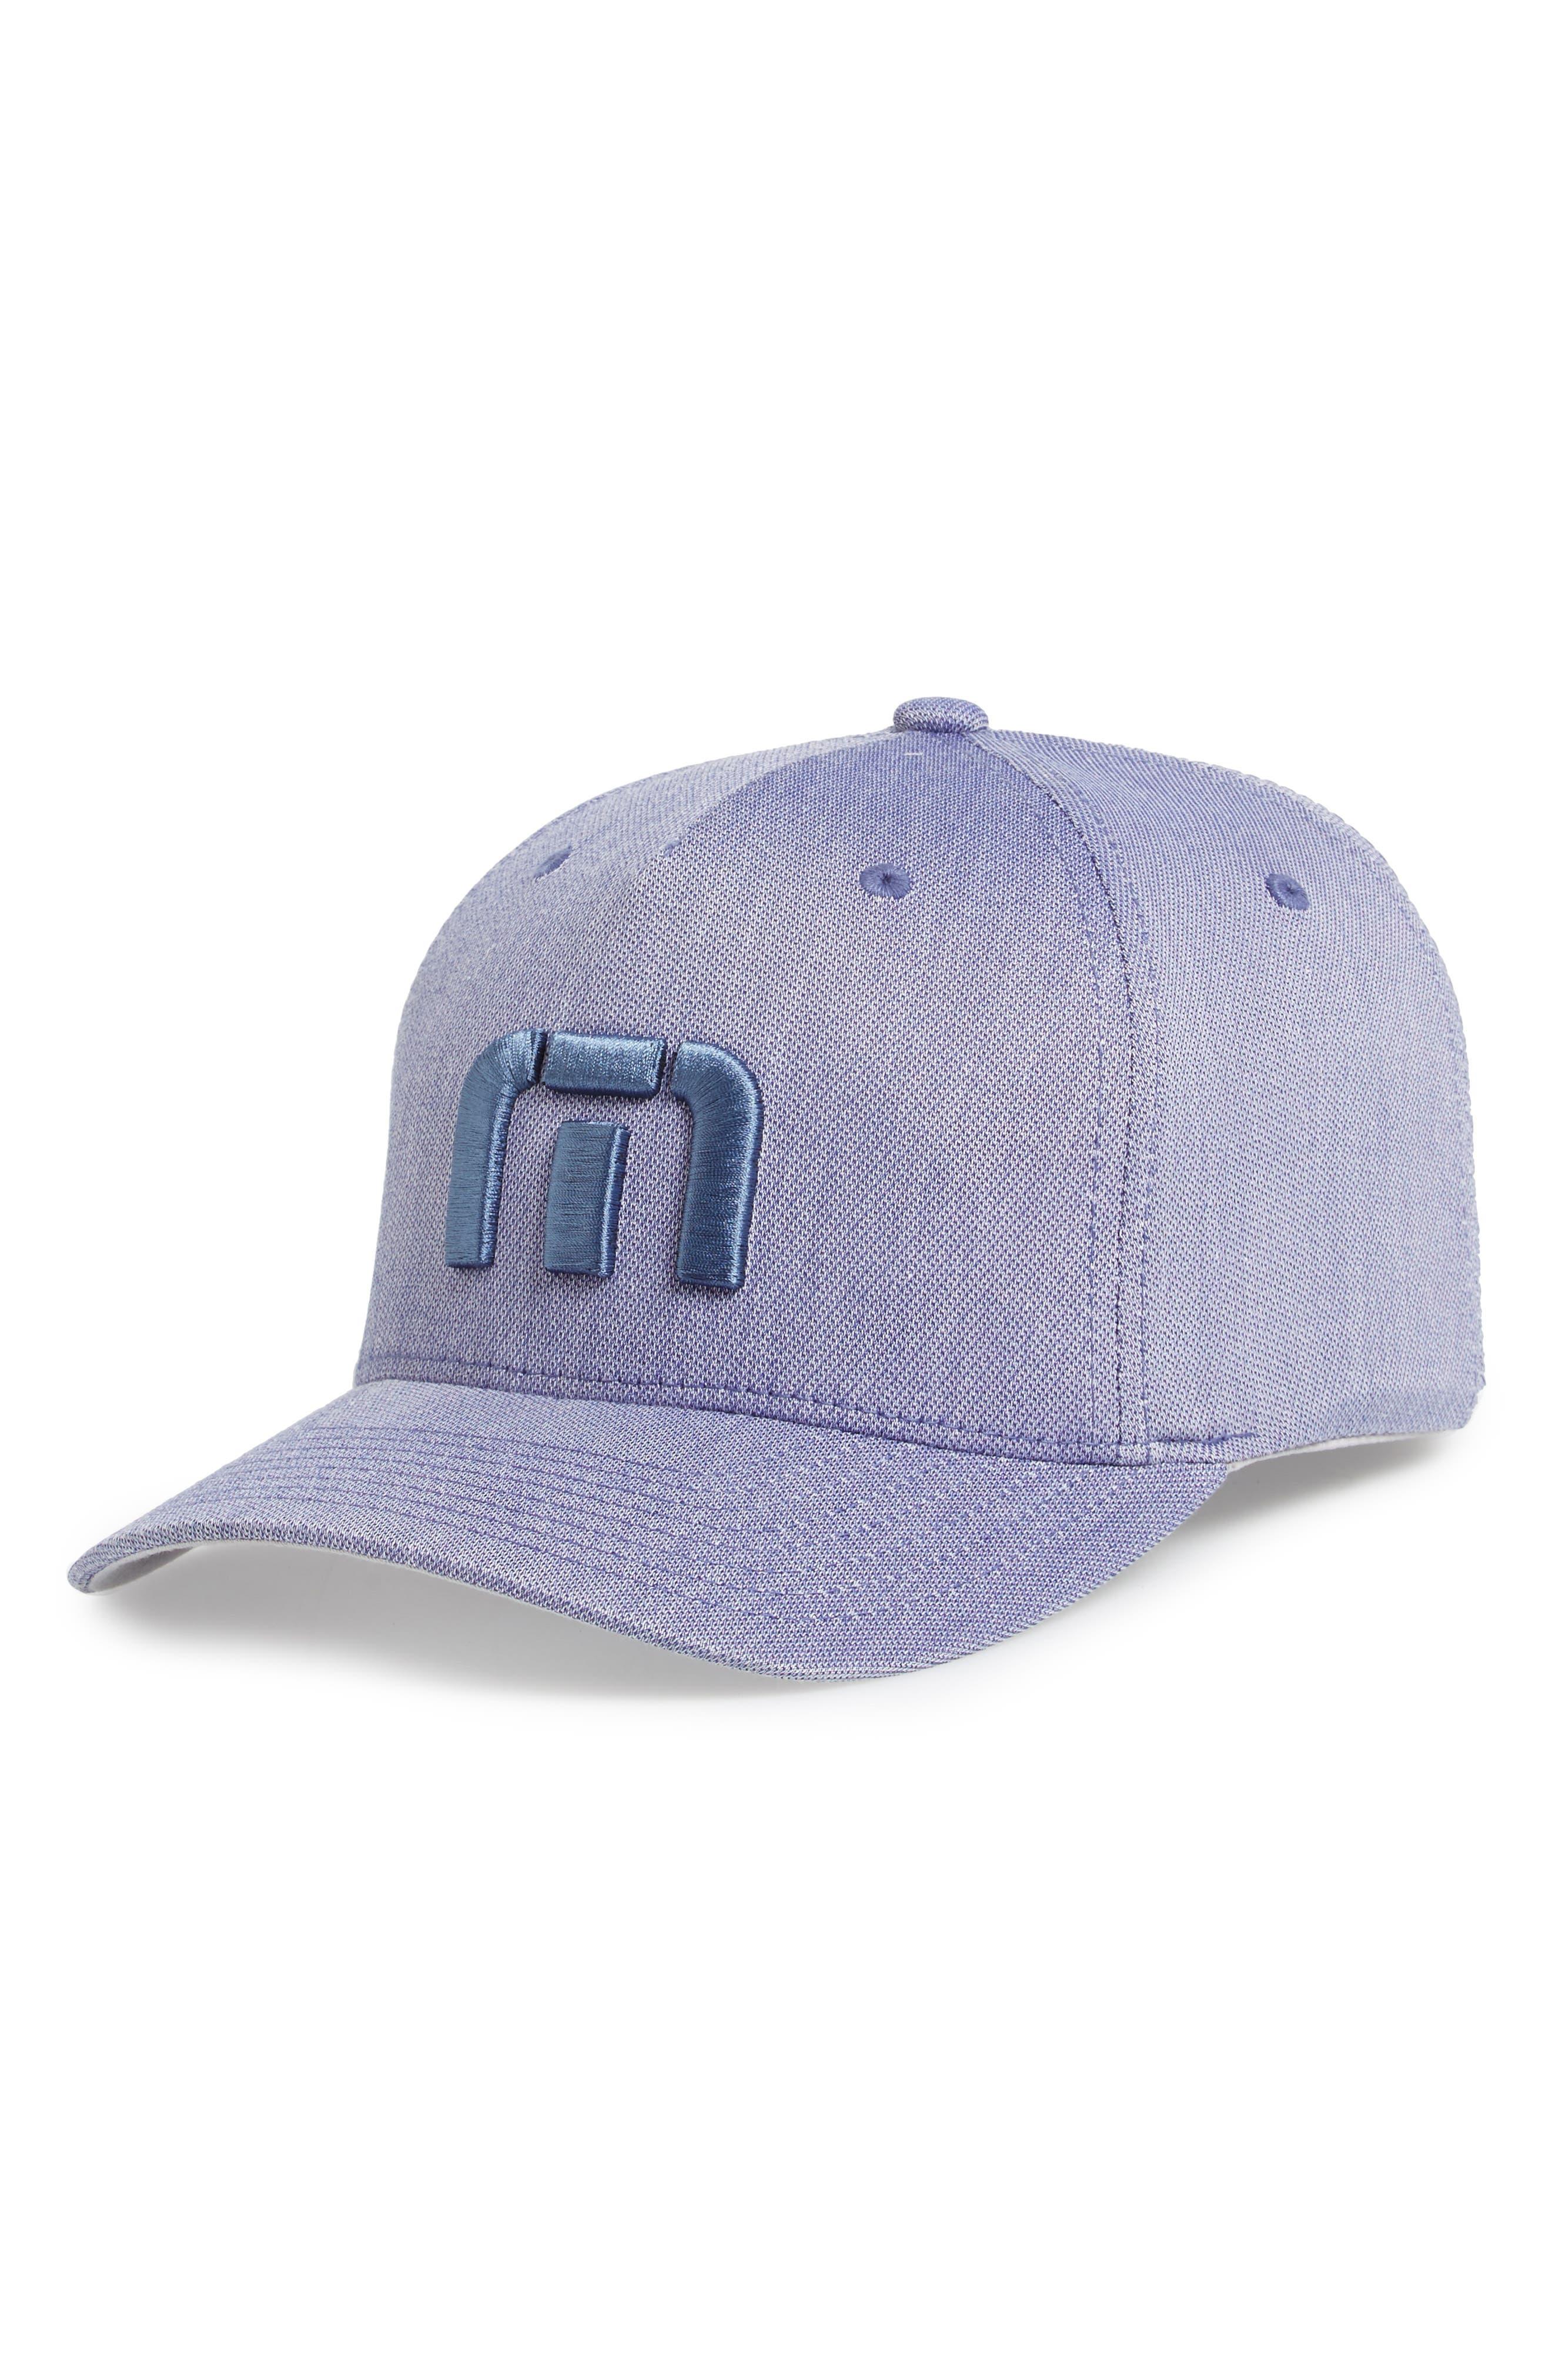 Main Image - Travis Mathew Van Dyke Flex Fit Baseball Cap